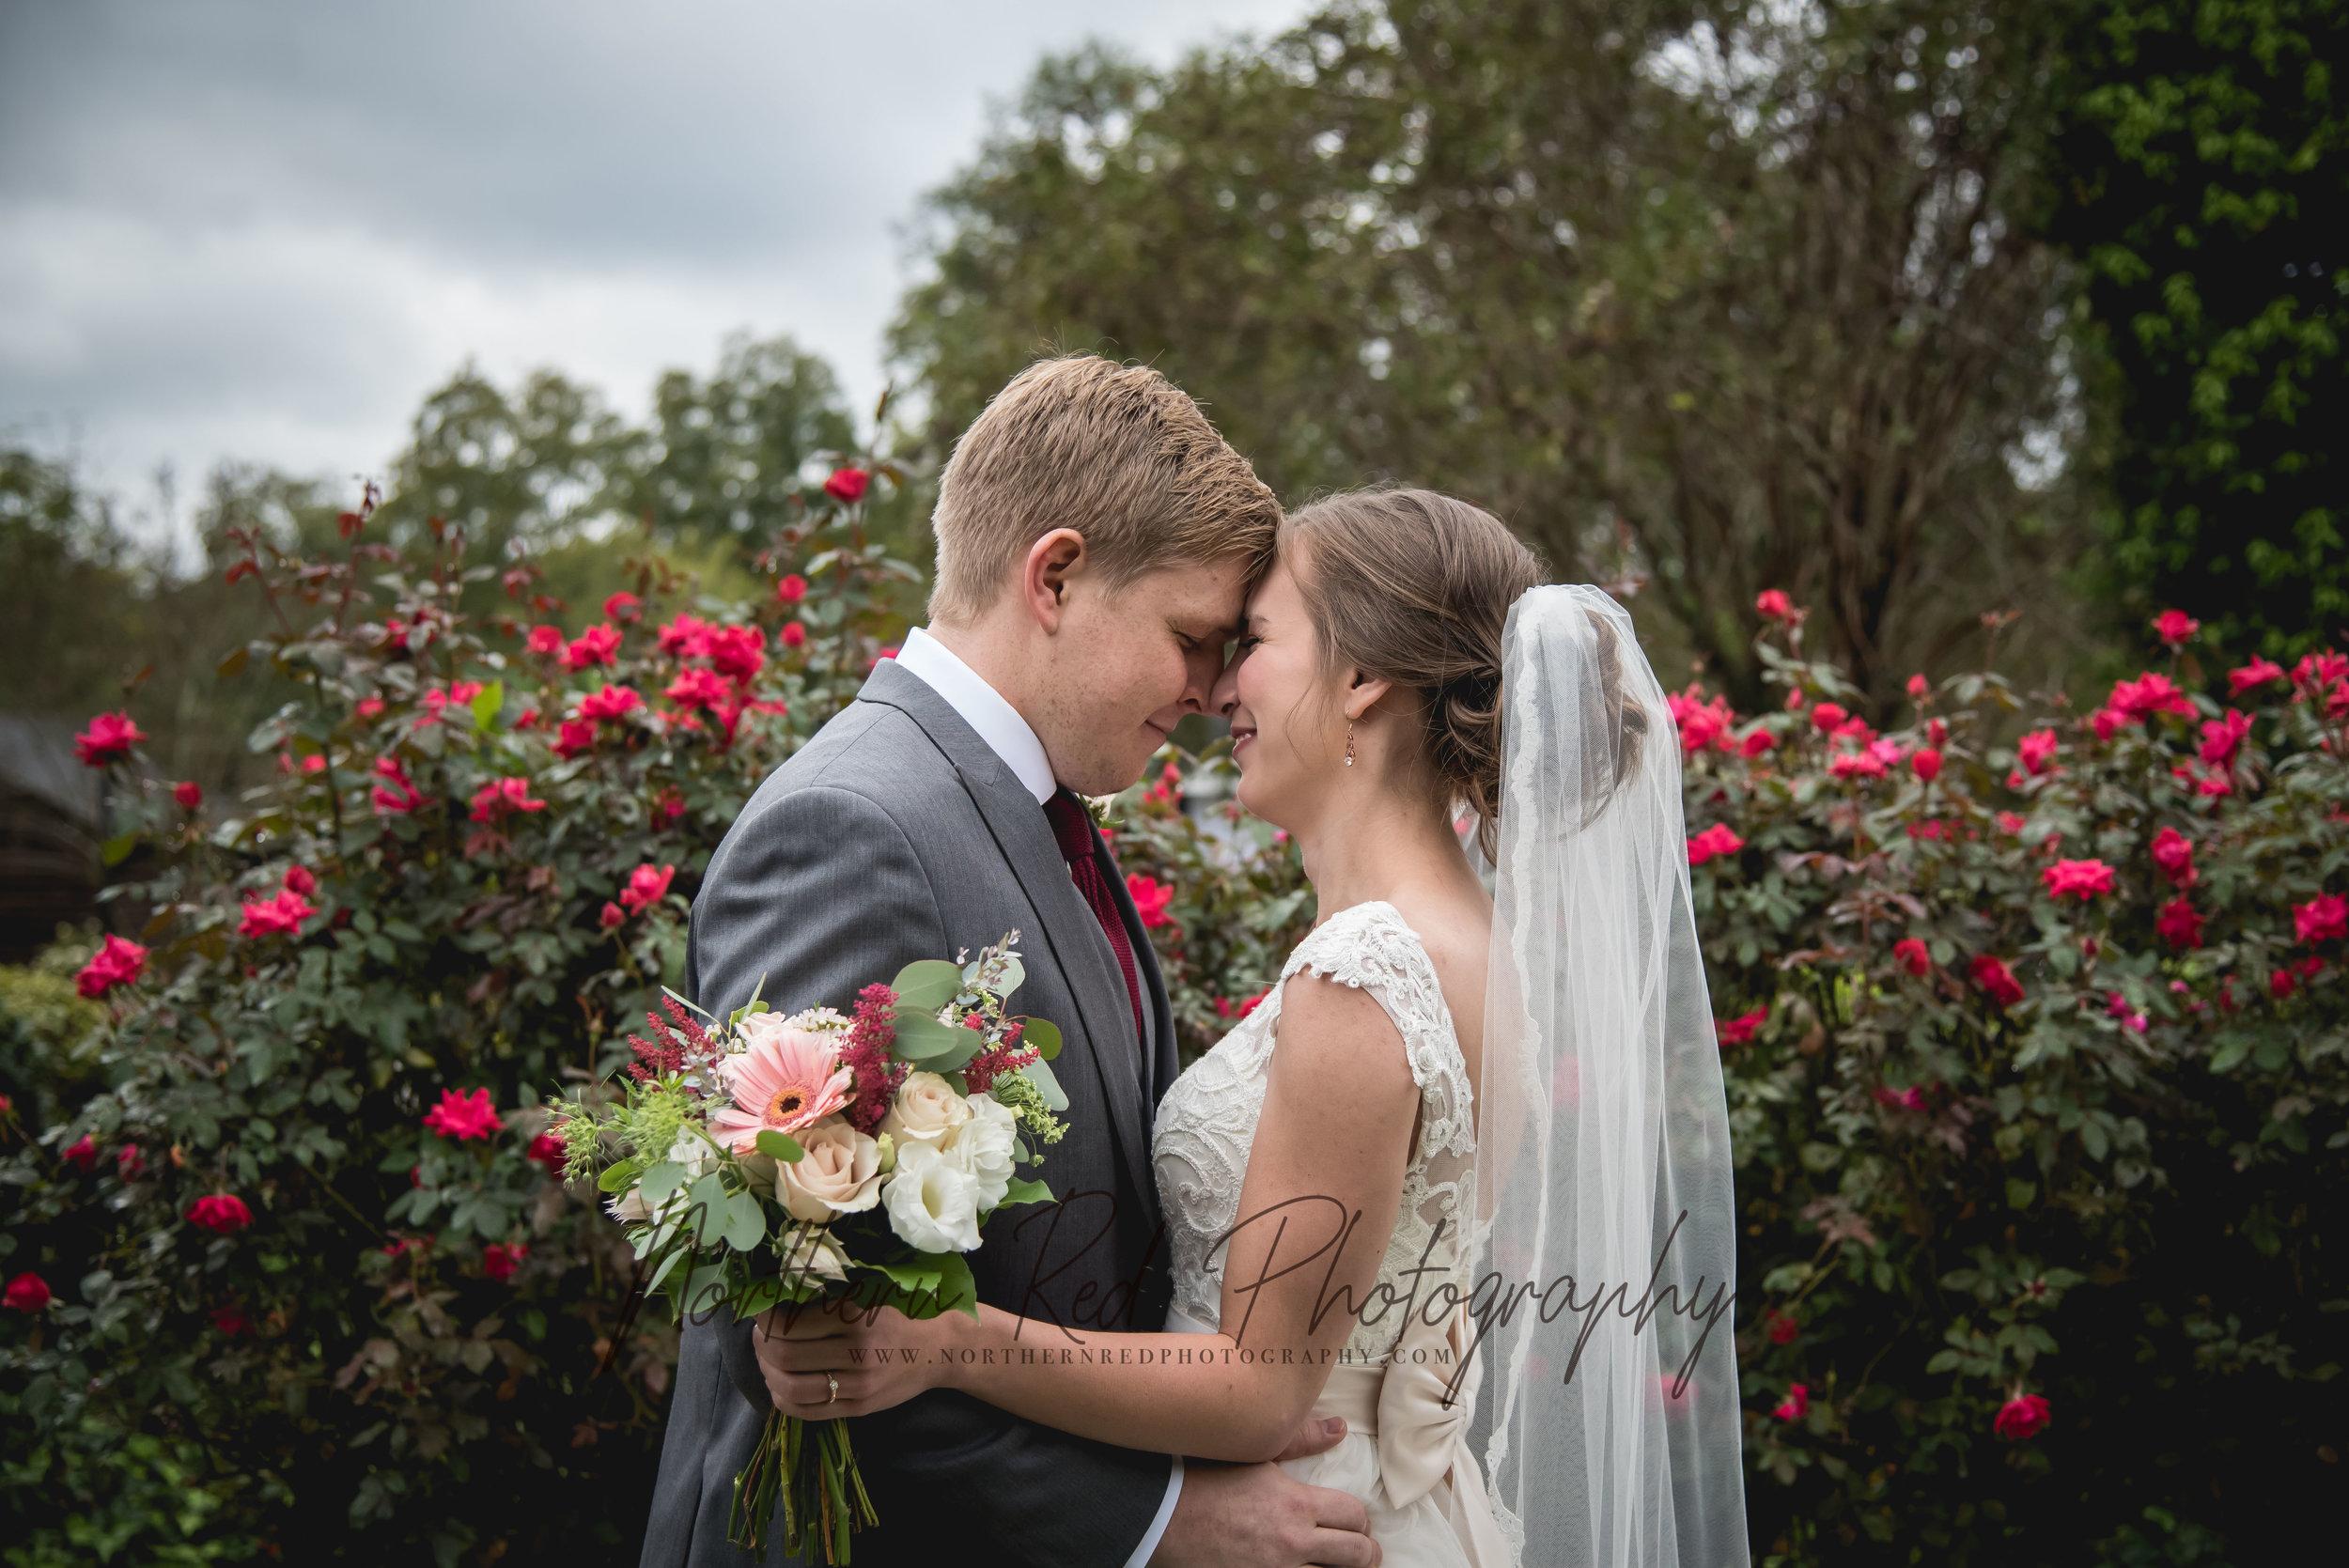 south carolina wedding photographer Northern Red Photography